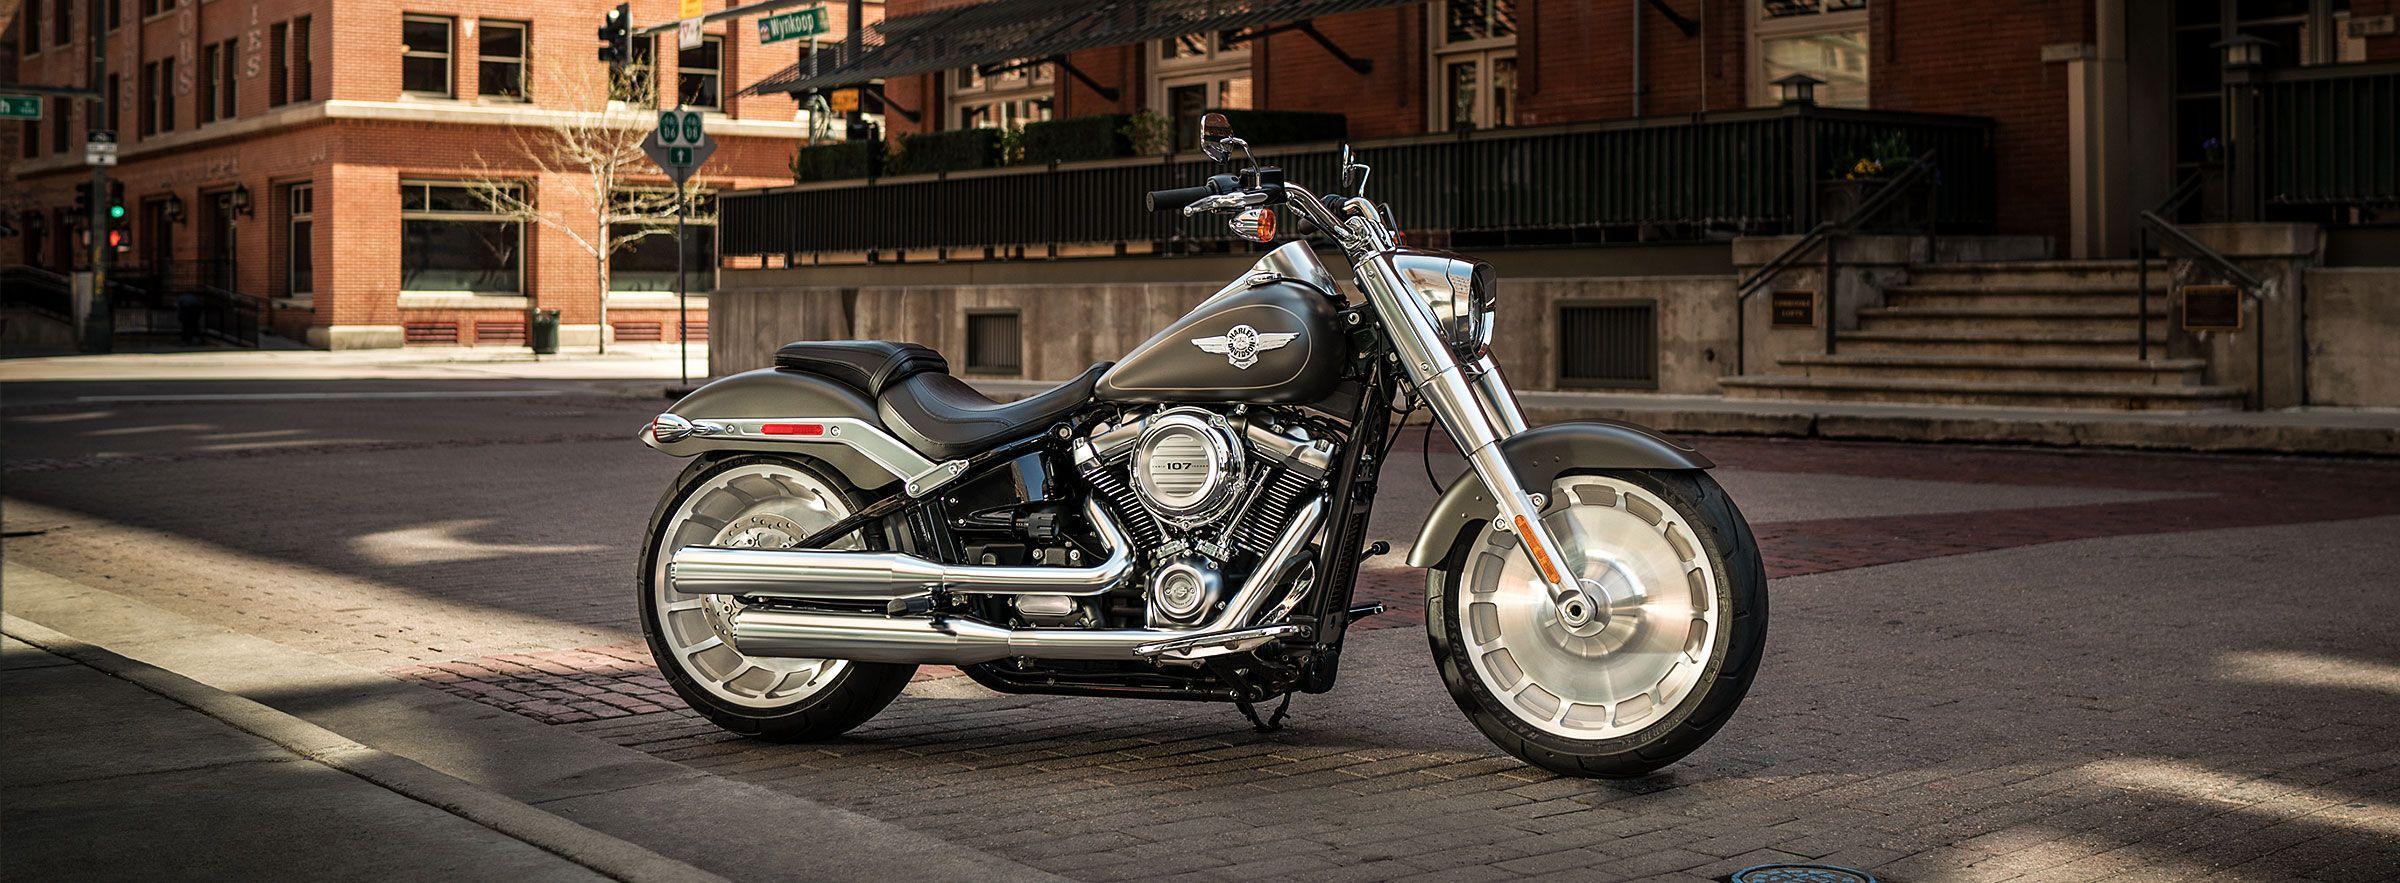 Harley Davidson Fat Boy Wallpapers Top Free Harley Davidson Fat Boy Backgrounds Wallpaperaccess